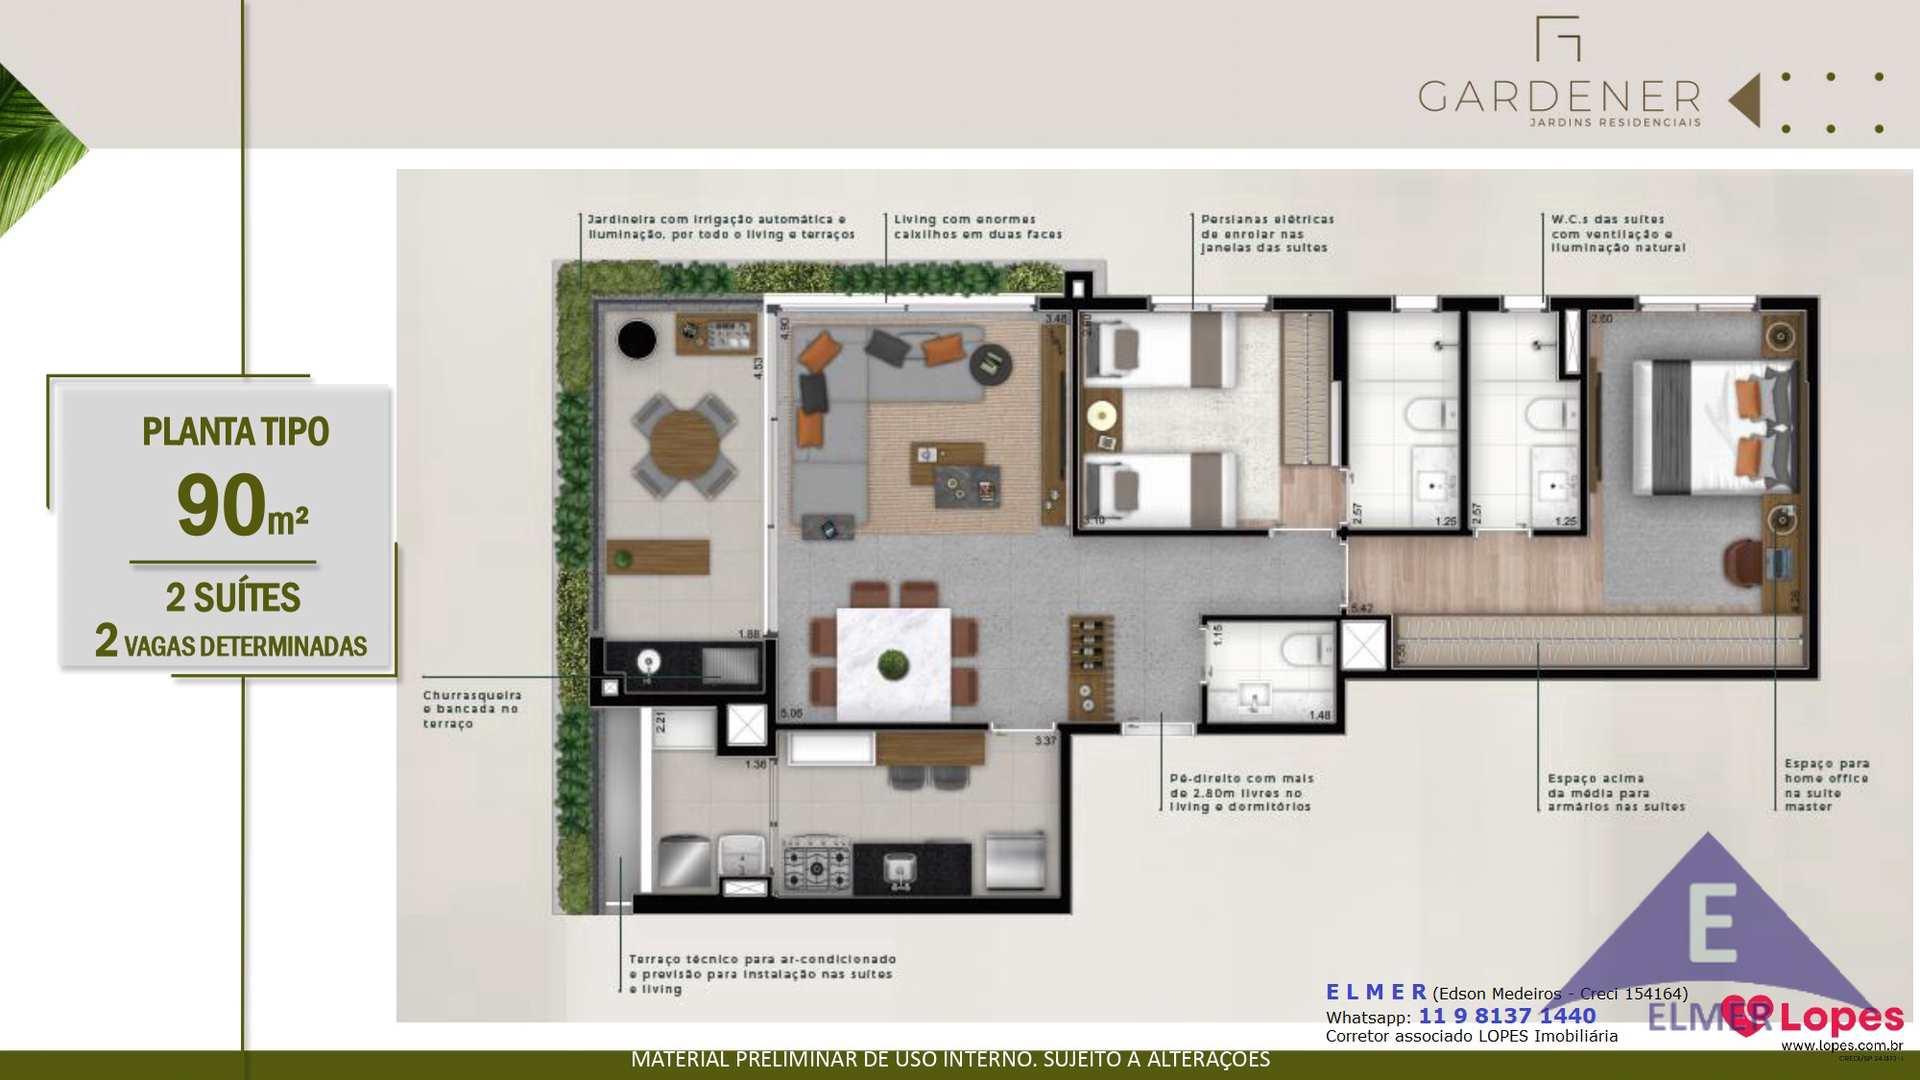 Planta tipo 90 m² - GARDENER - Elmer